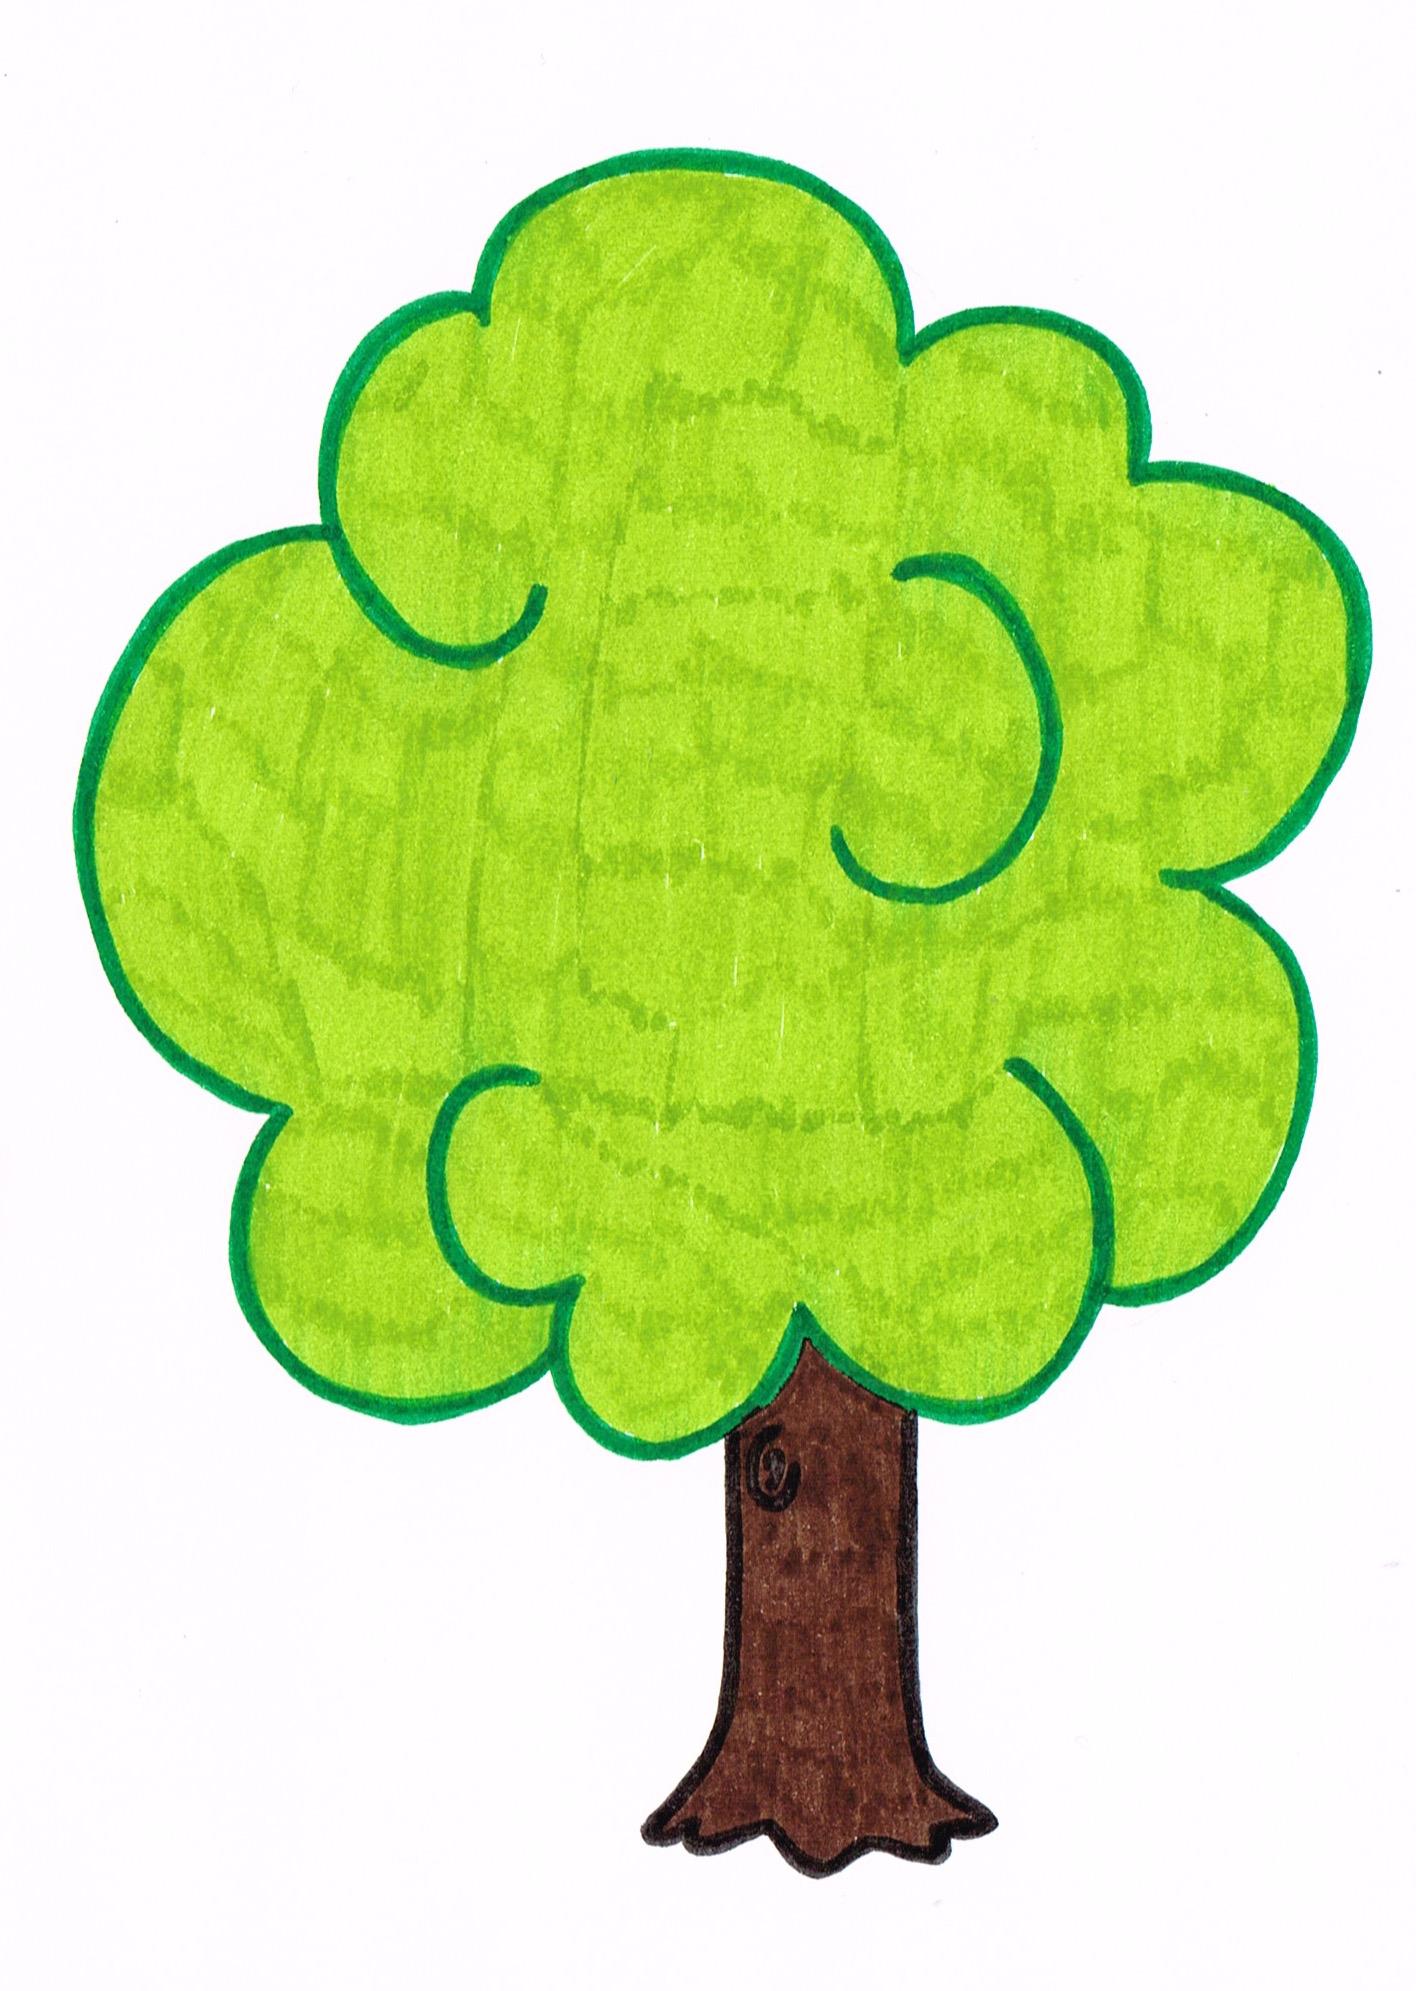 Scenarios/assets/Baum 2.jpeg